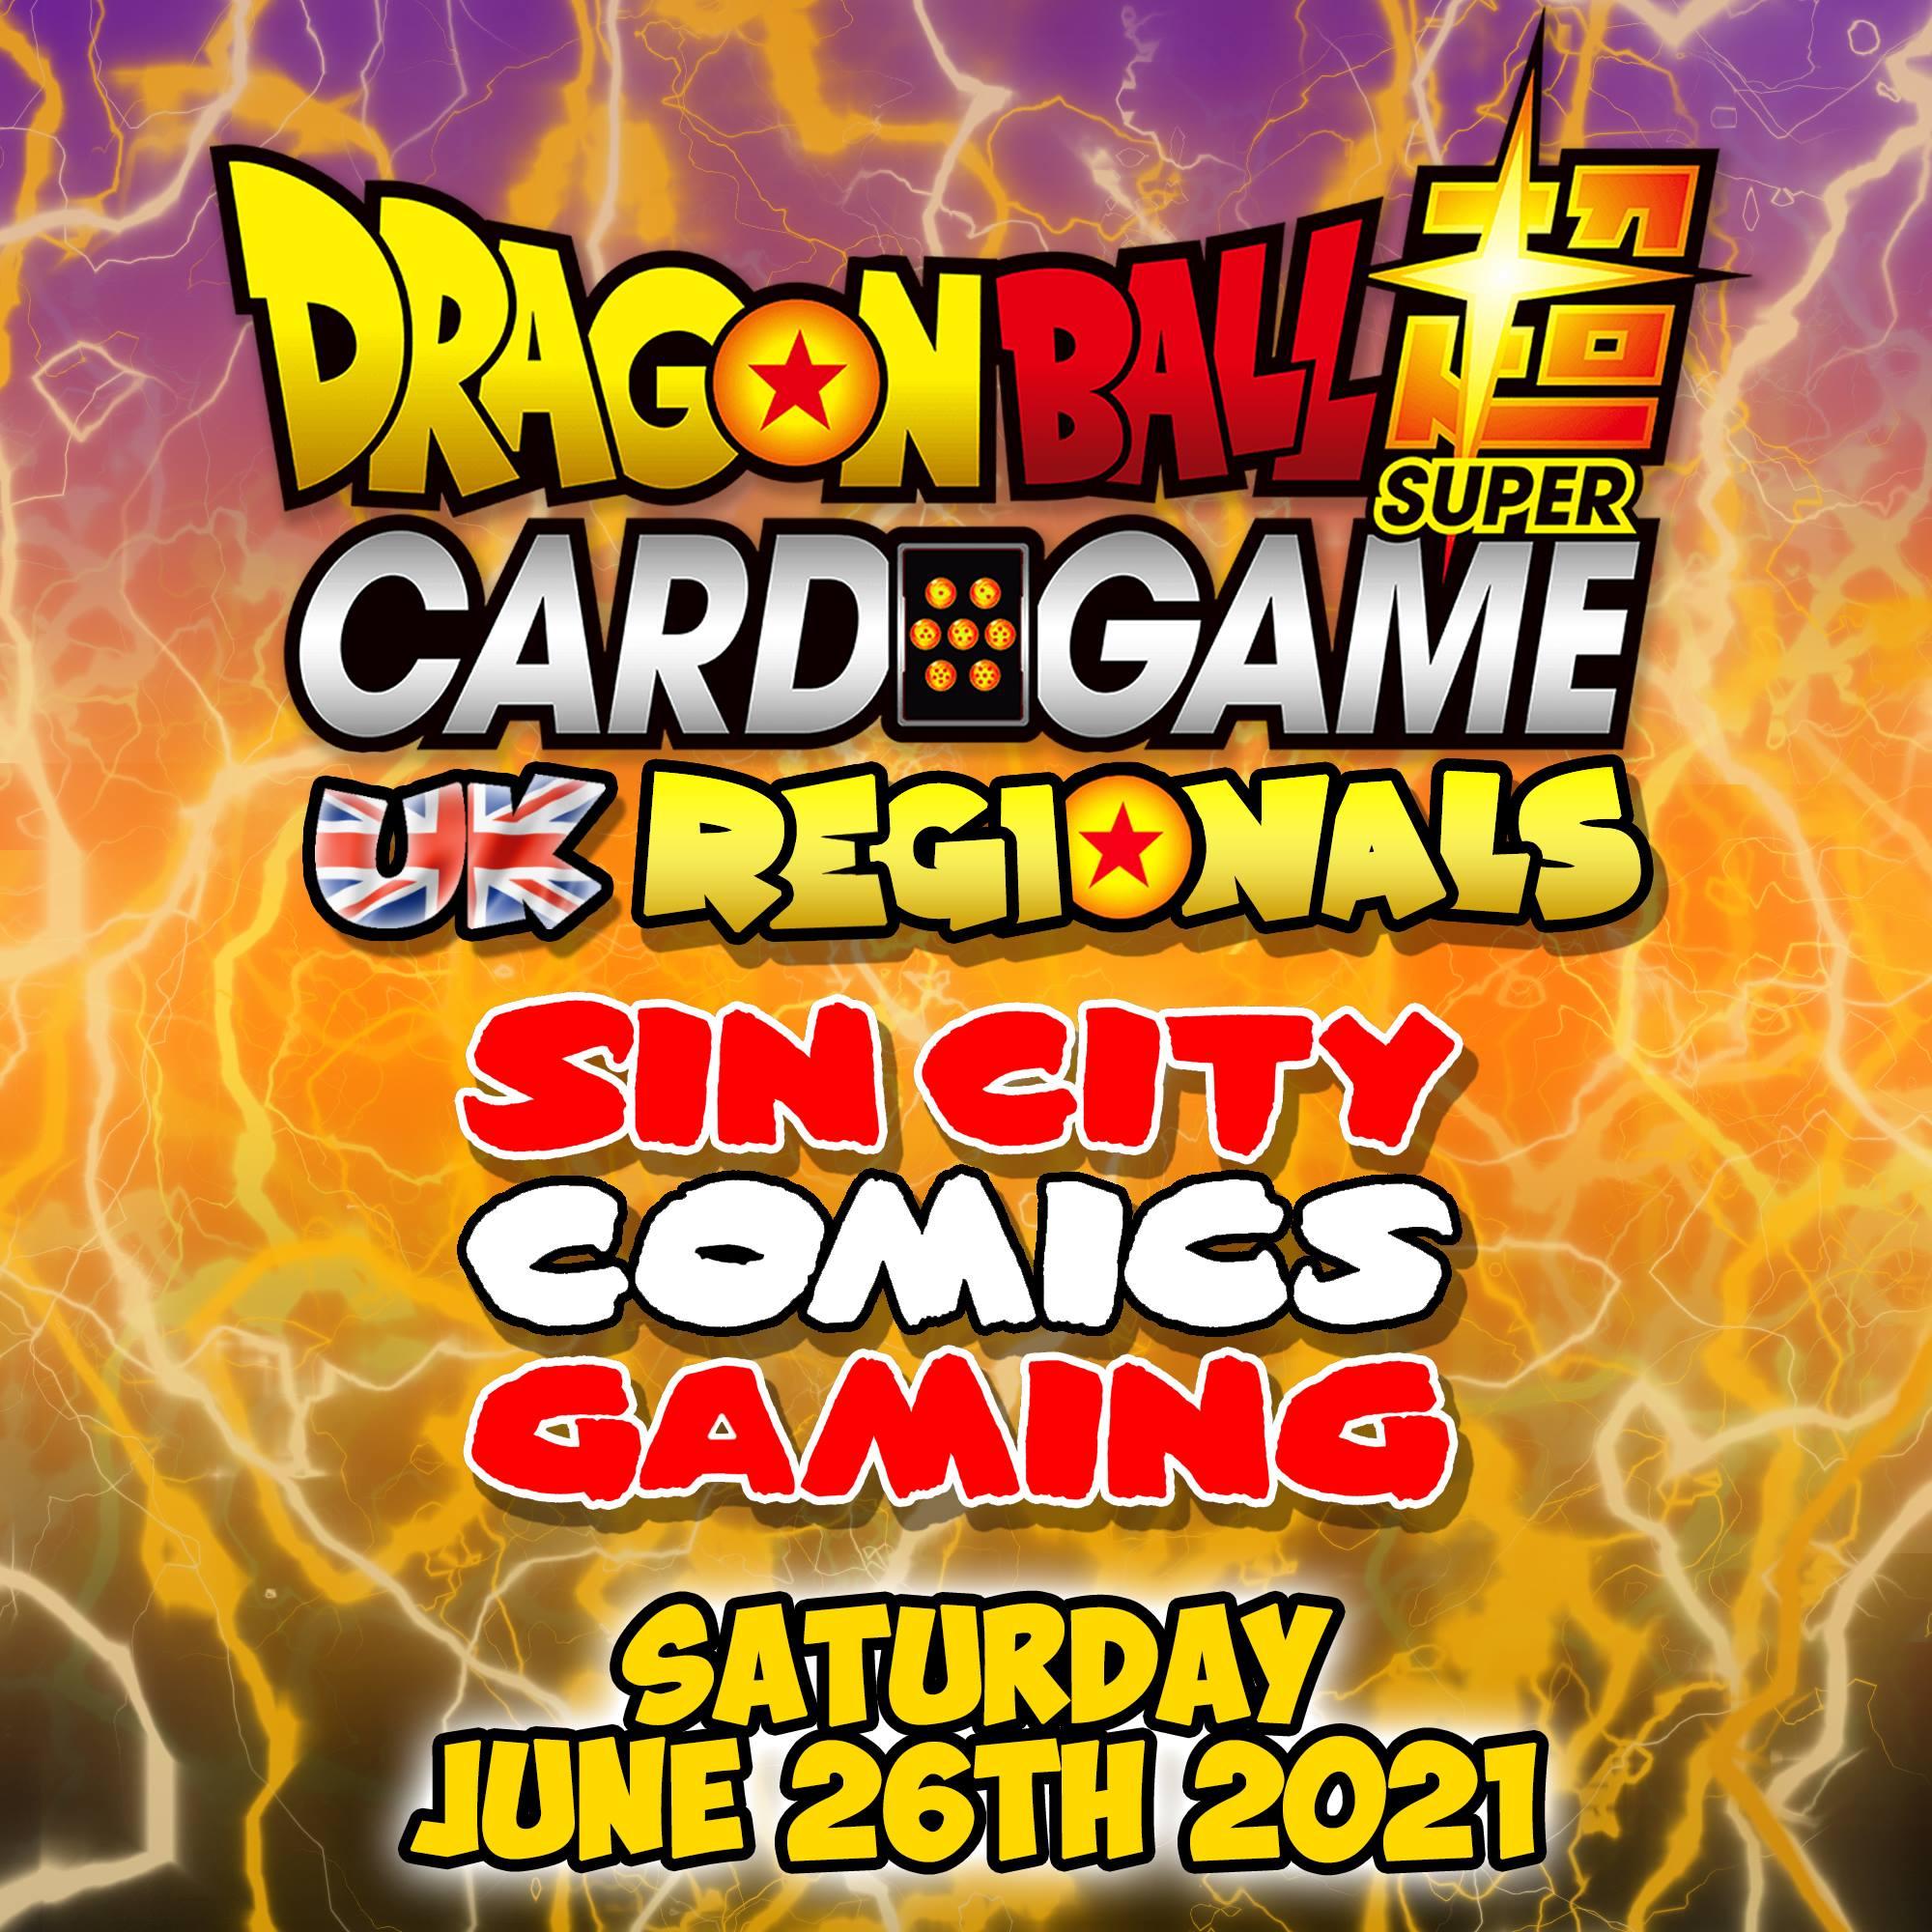 Dragonball Card Game 2021 Regionals